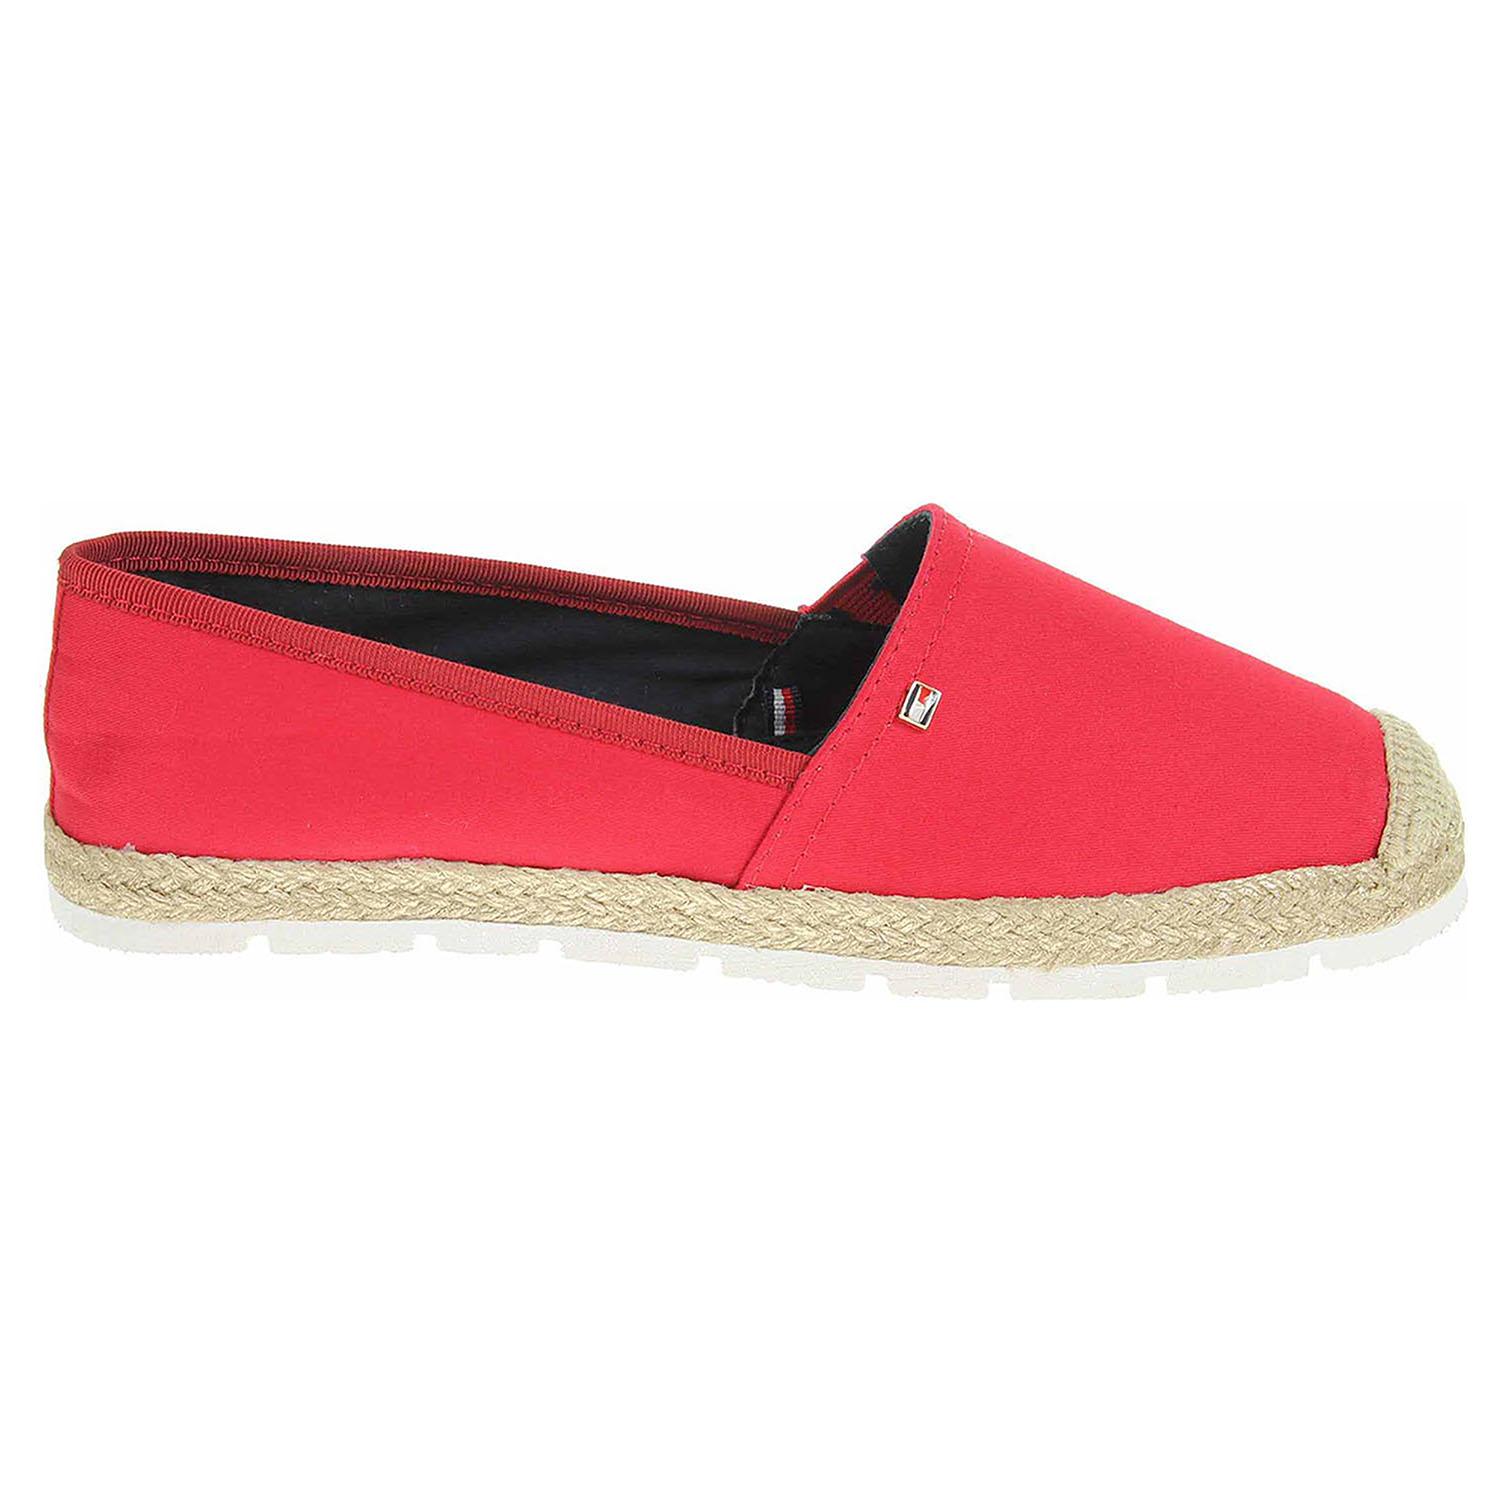 Tommy Hilfiger dámská obuv FW0FW02409 611 tango red FW0FW02409 611 39